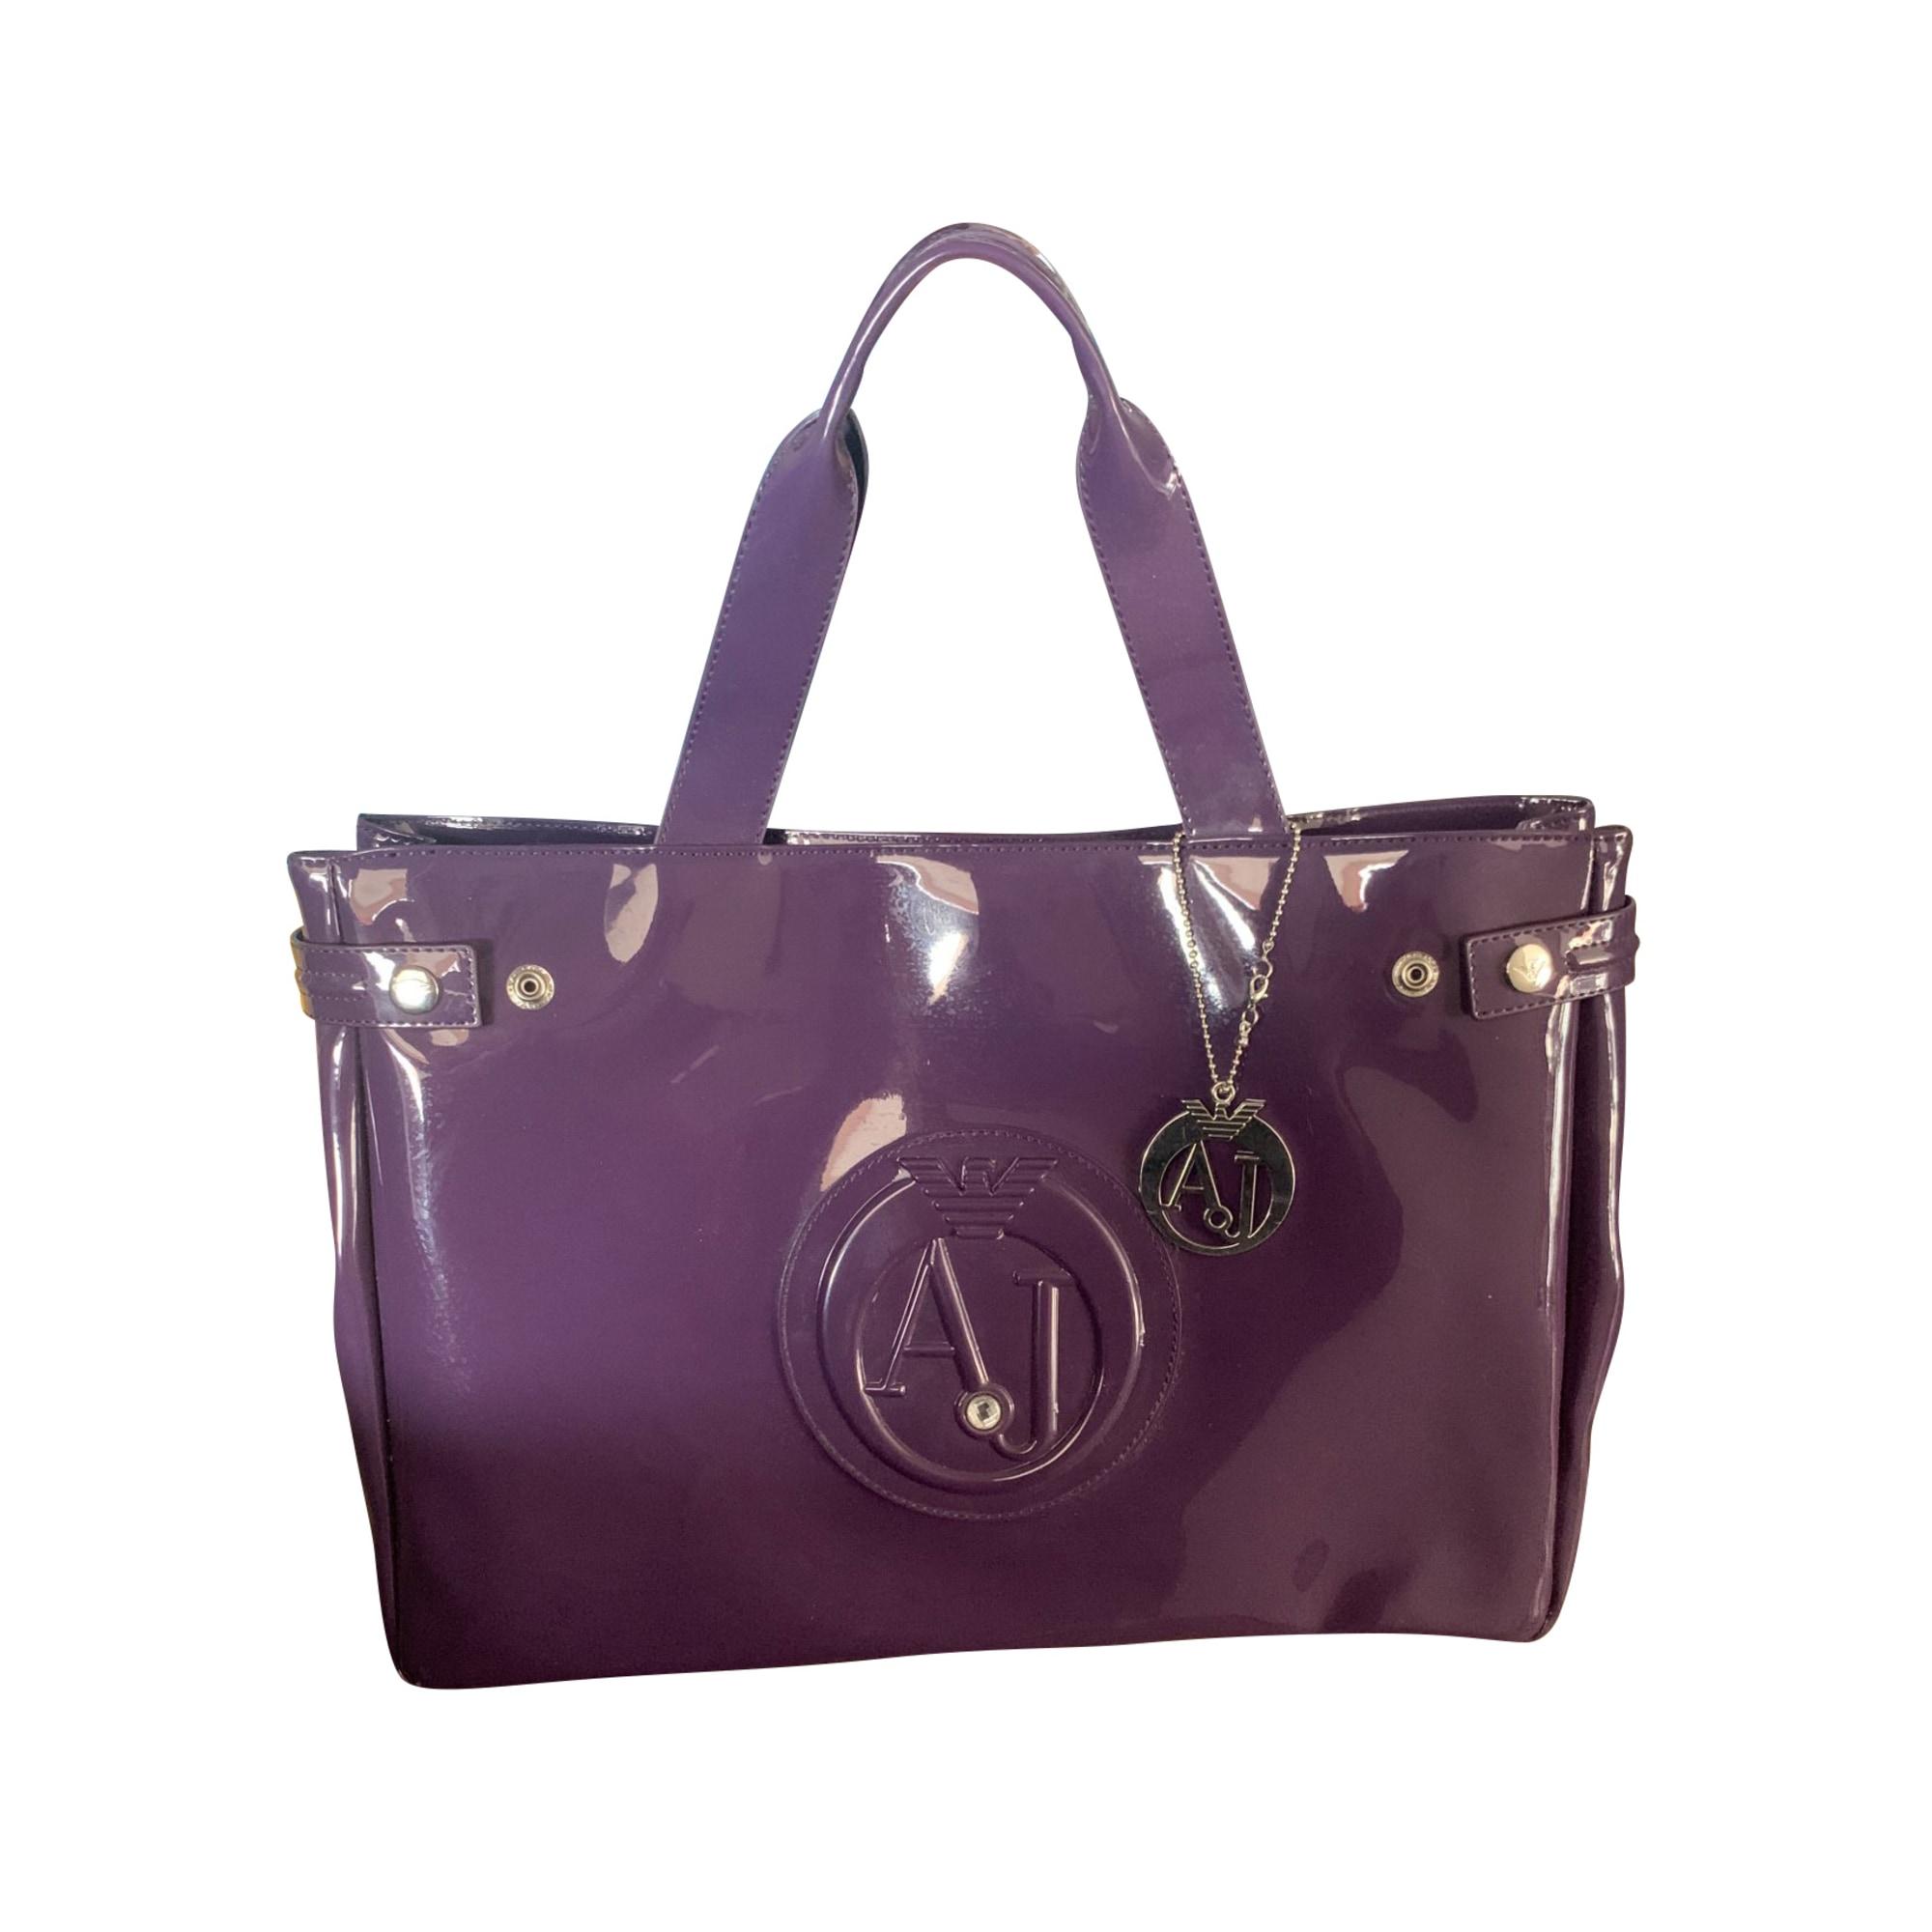 Lederhandtasche ARMANI JEANS Violett, malvenfarben, lavendelfarben